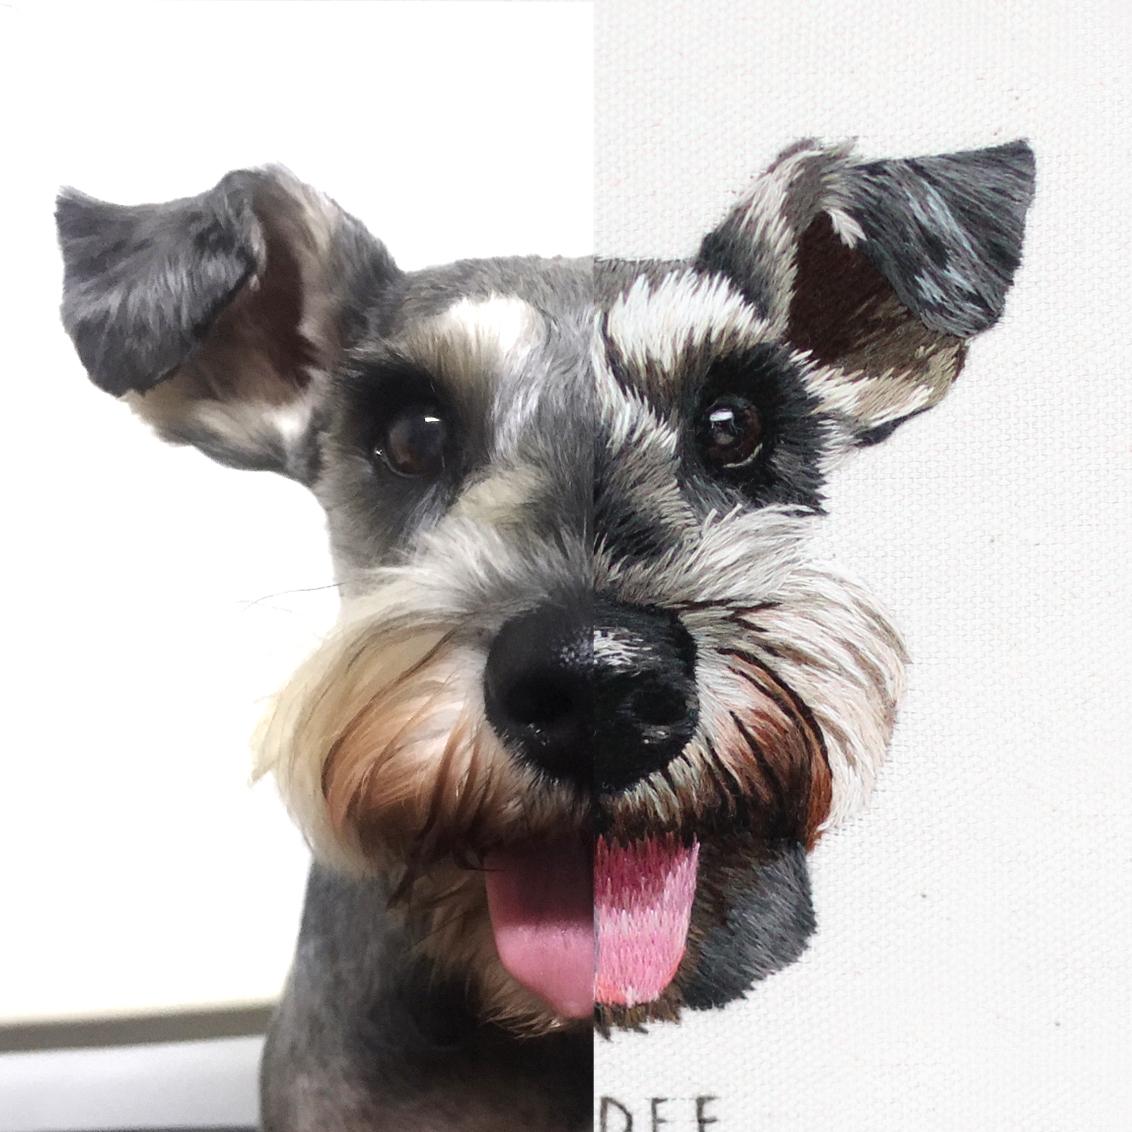 deedee_schnauzer_dog_custom_pet_portrait_threadpainting_needlepainting_silkshading_embroidery_by_emillie_ferris_.jpg